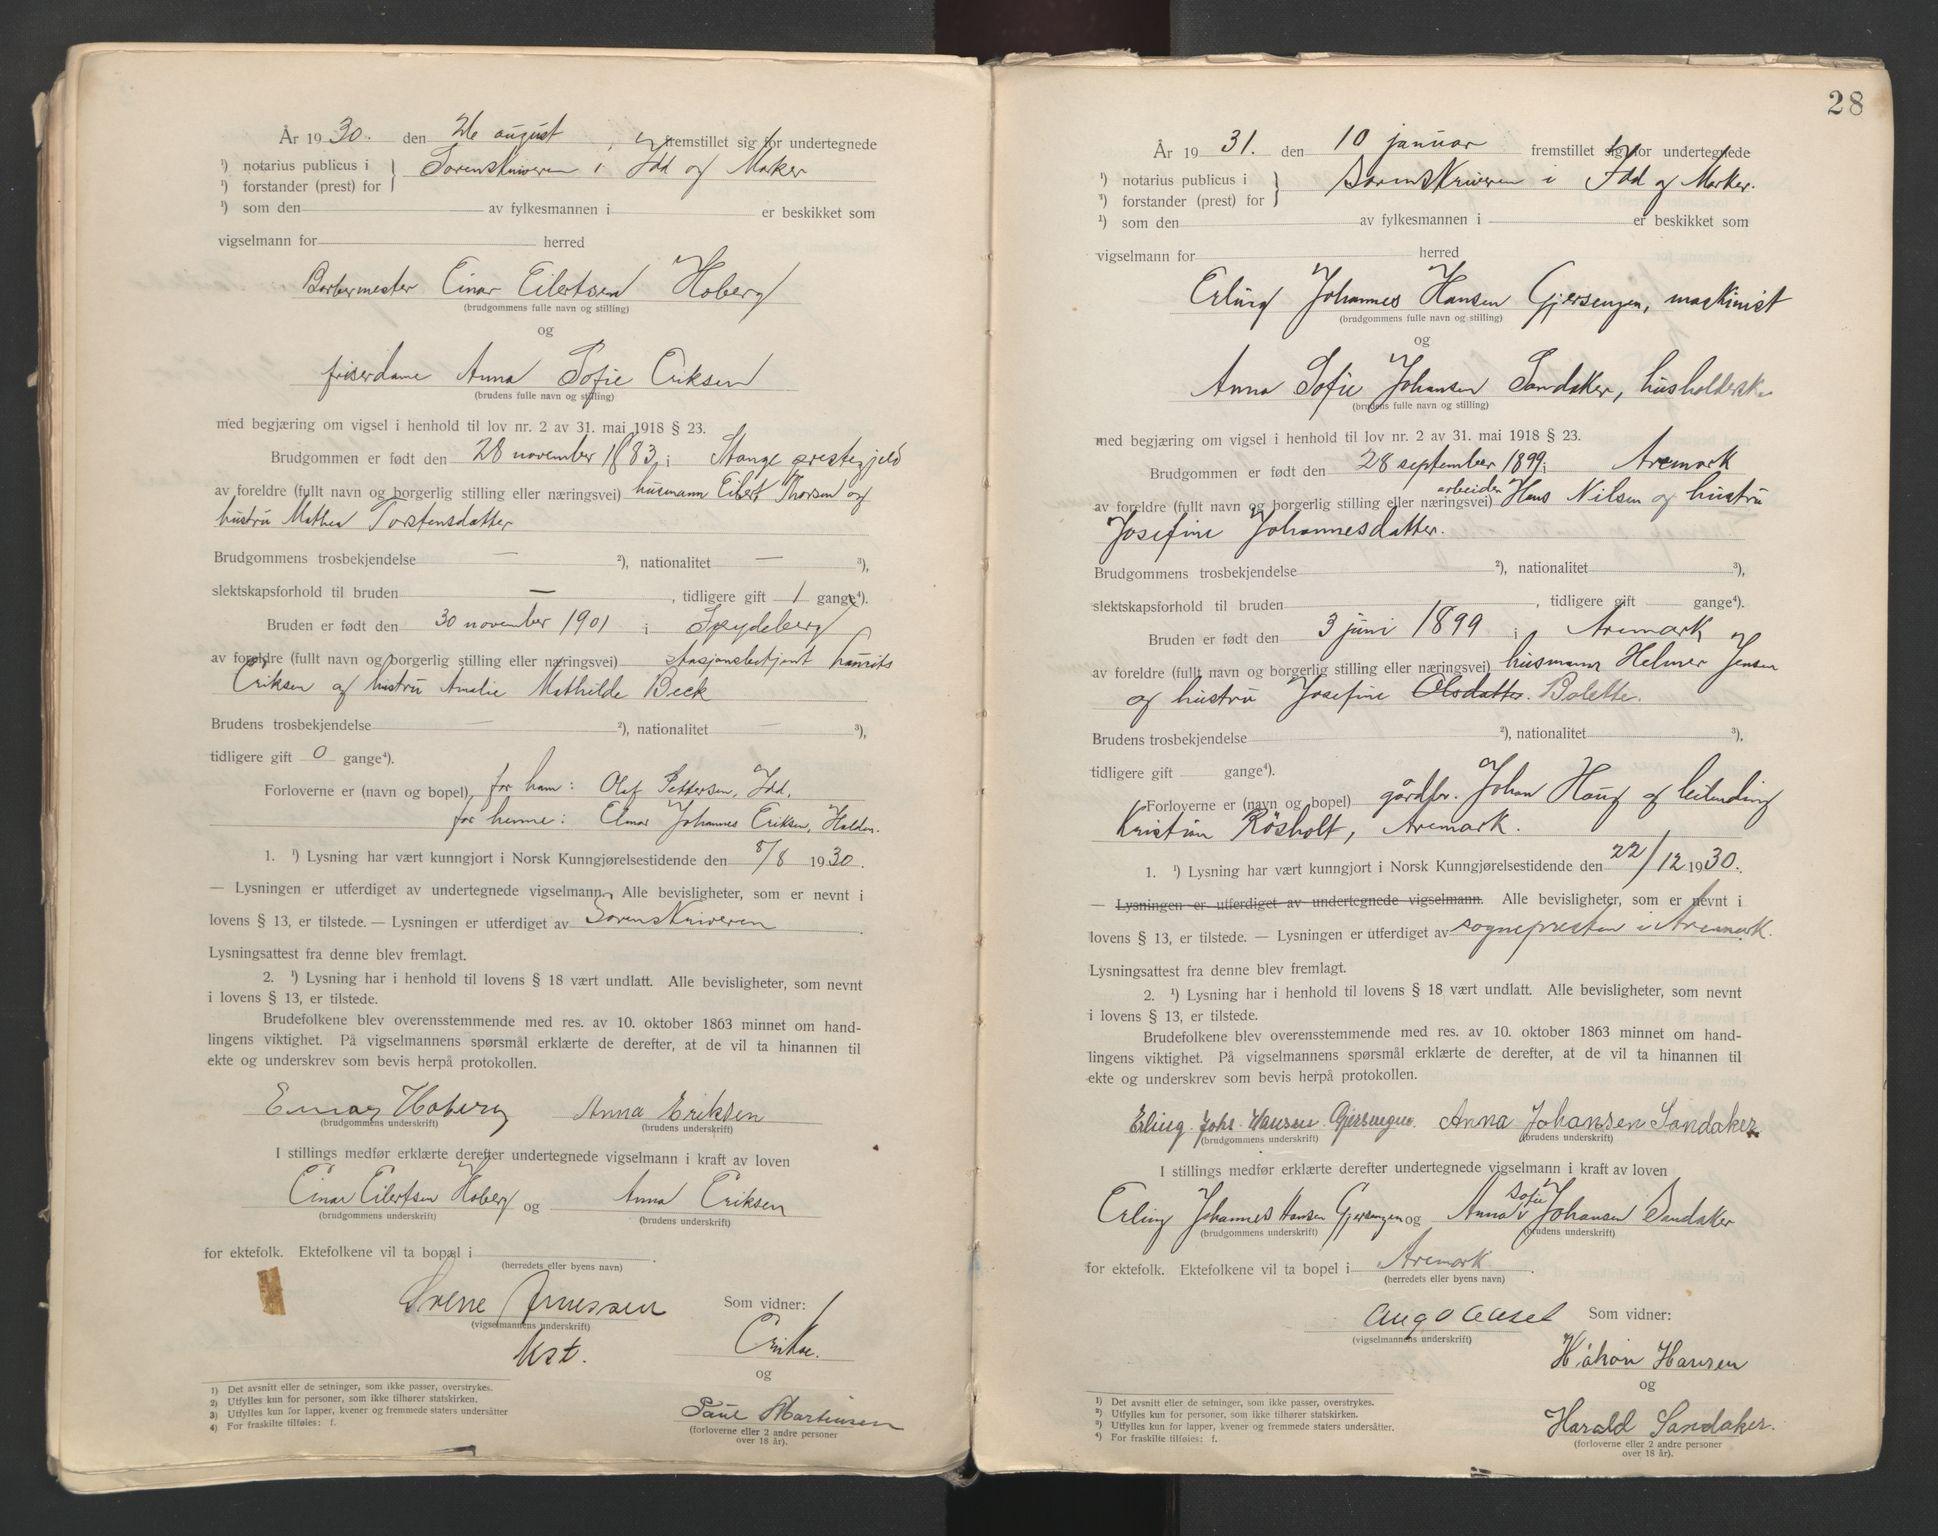 SAO, Idd og Marker sorenskriveri, L/Lc/L0001: Vigselsbøker, 1920-1942, s. 28